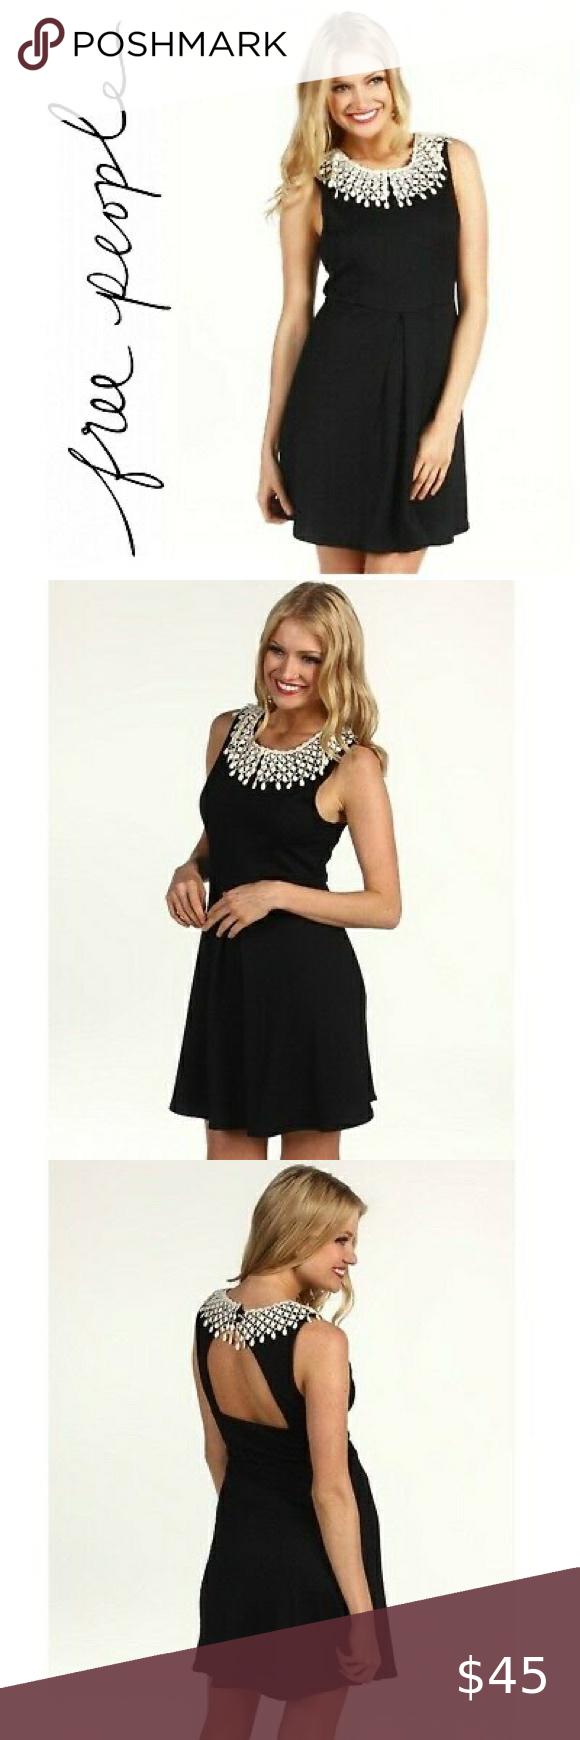 Free People Black Waffle Knit Lace Collar Dress Textured Knit Dress Lace Collar Waffle Knit [ 1740 x 580 Pixel ]